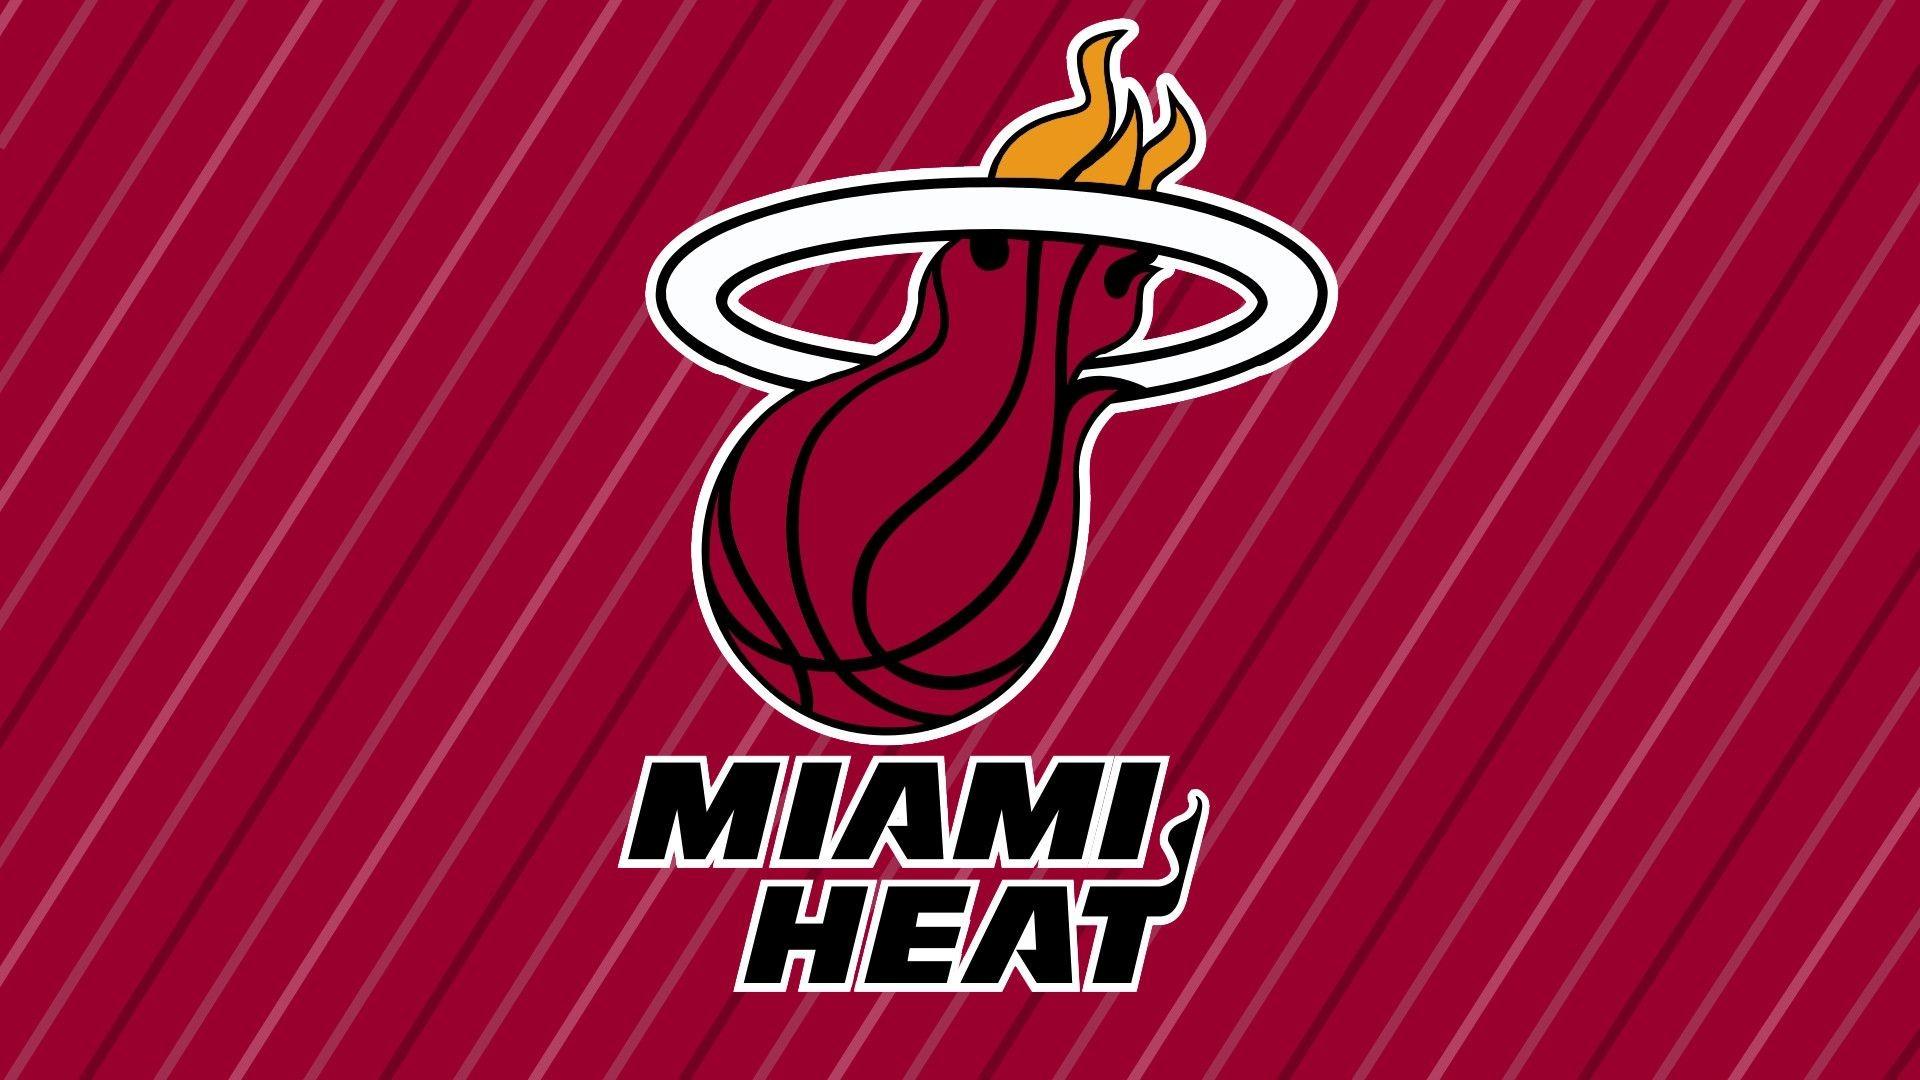 NBA Logo Wallpaper Free Download